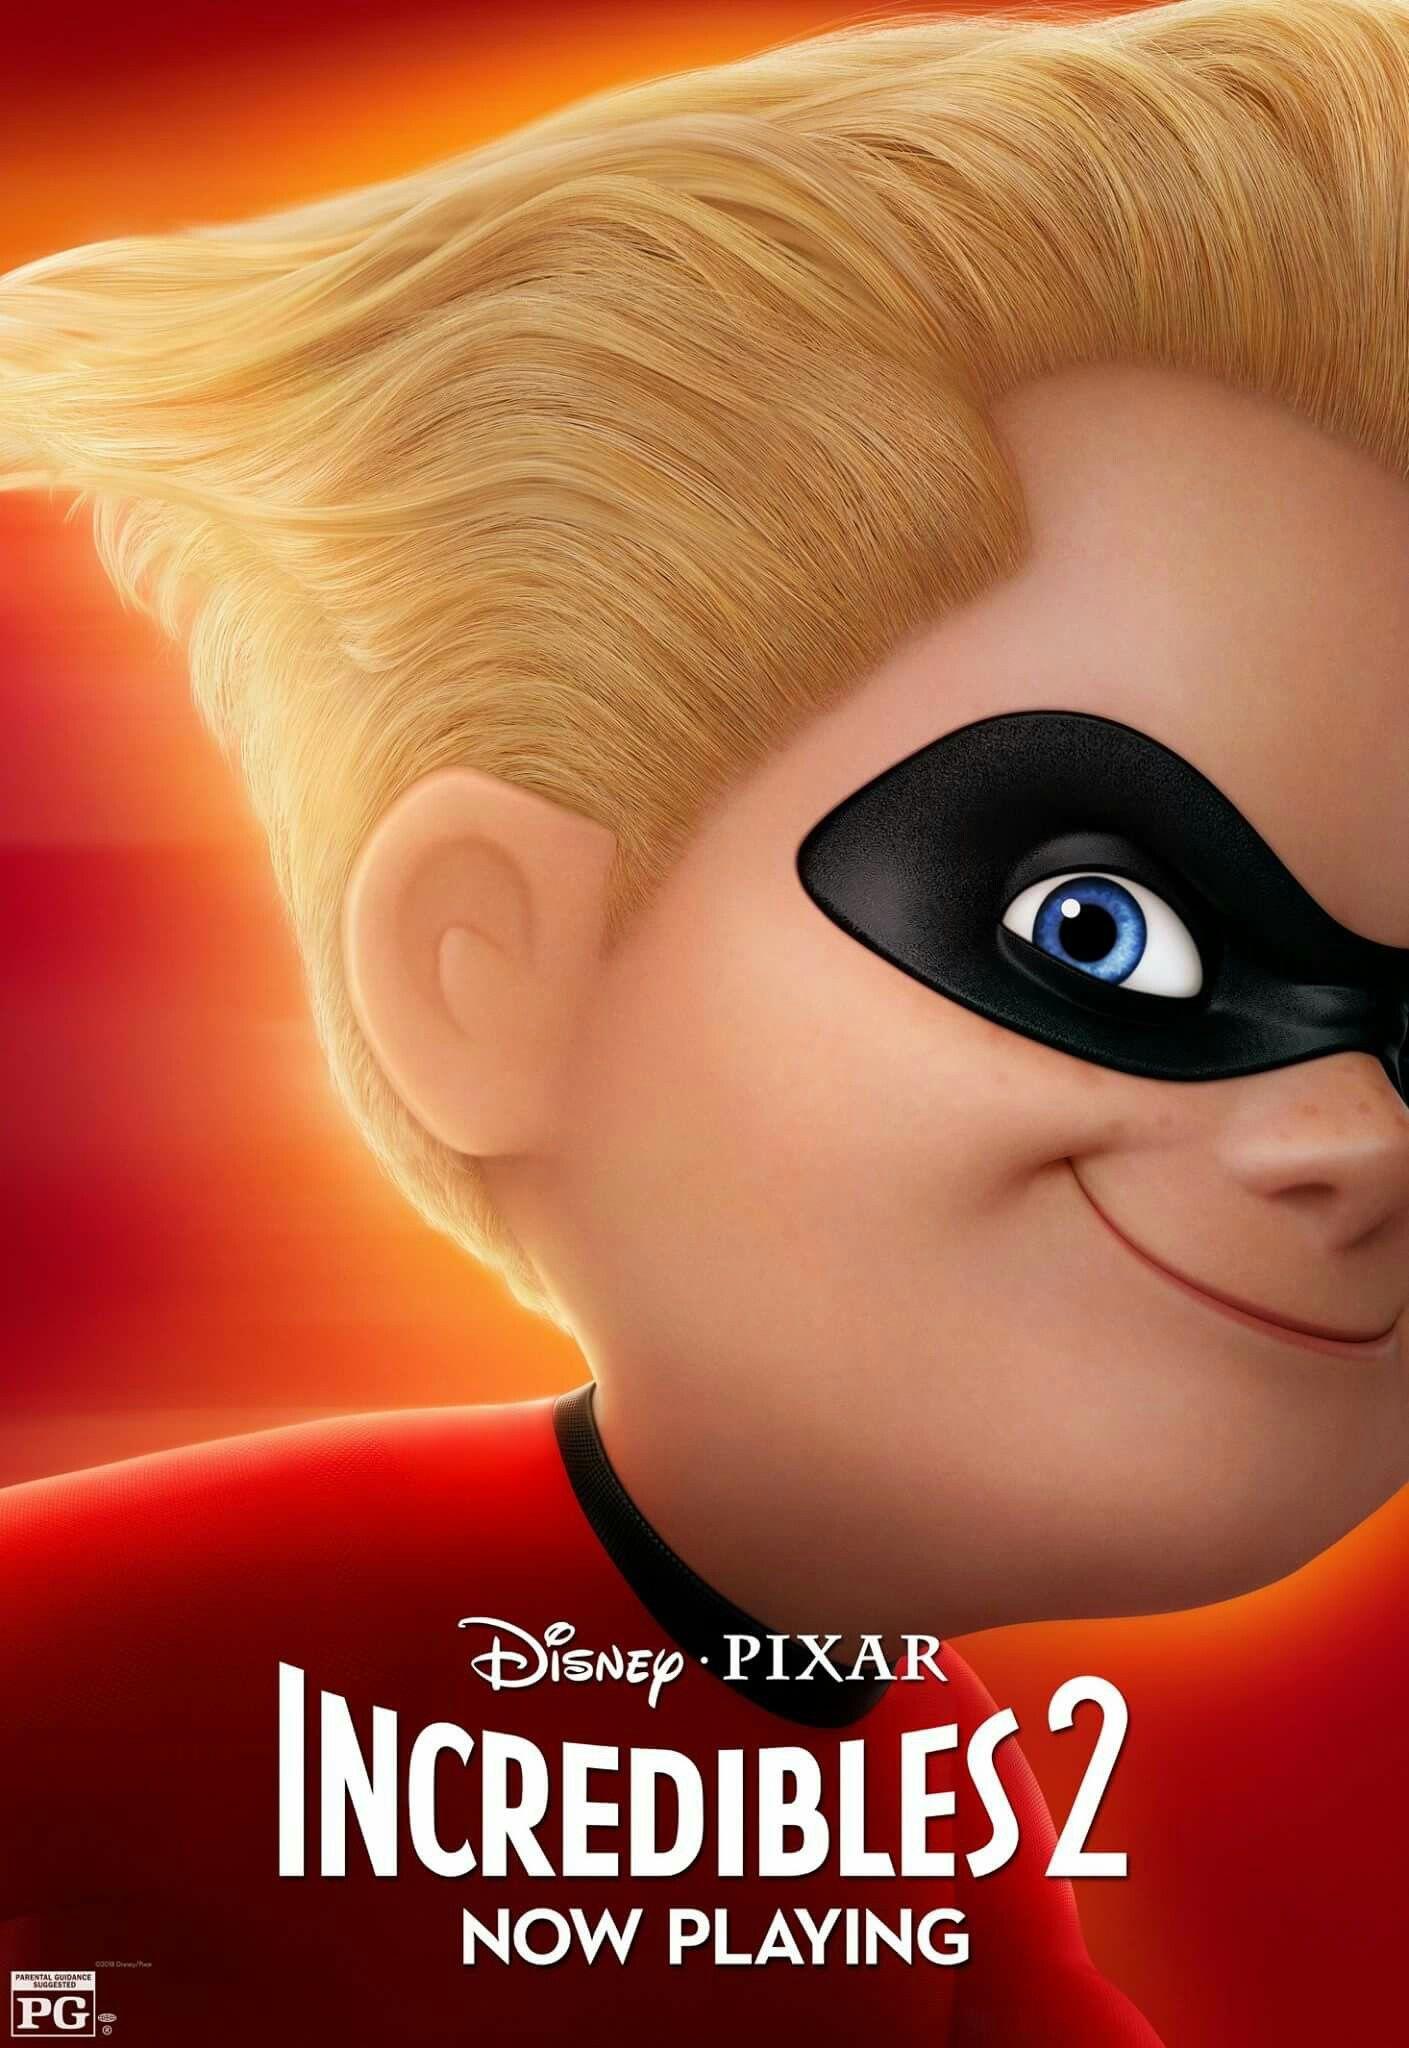 Pin By Sami Reaz On Incredibles 2 Character Poster Incredibles 2 Characters The Incredibles Incredibles 2 Poster